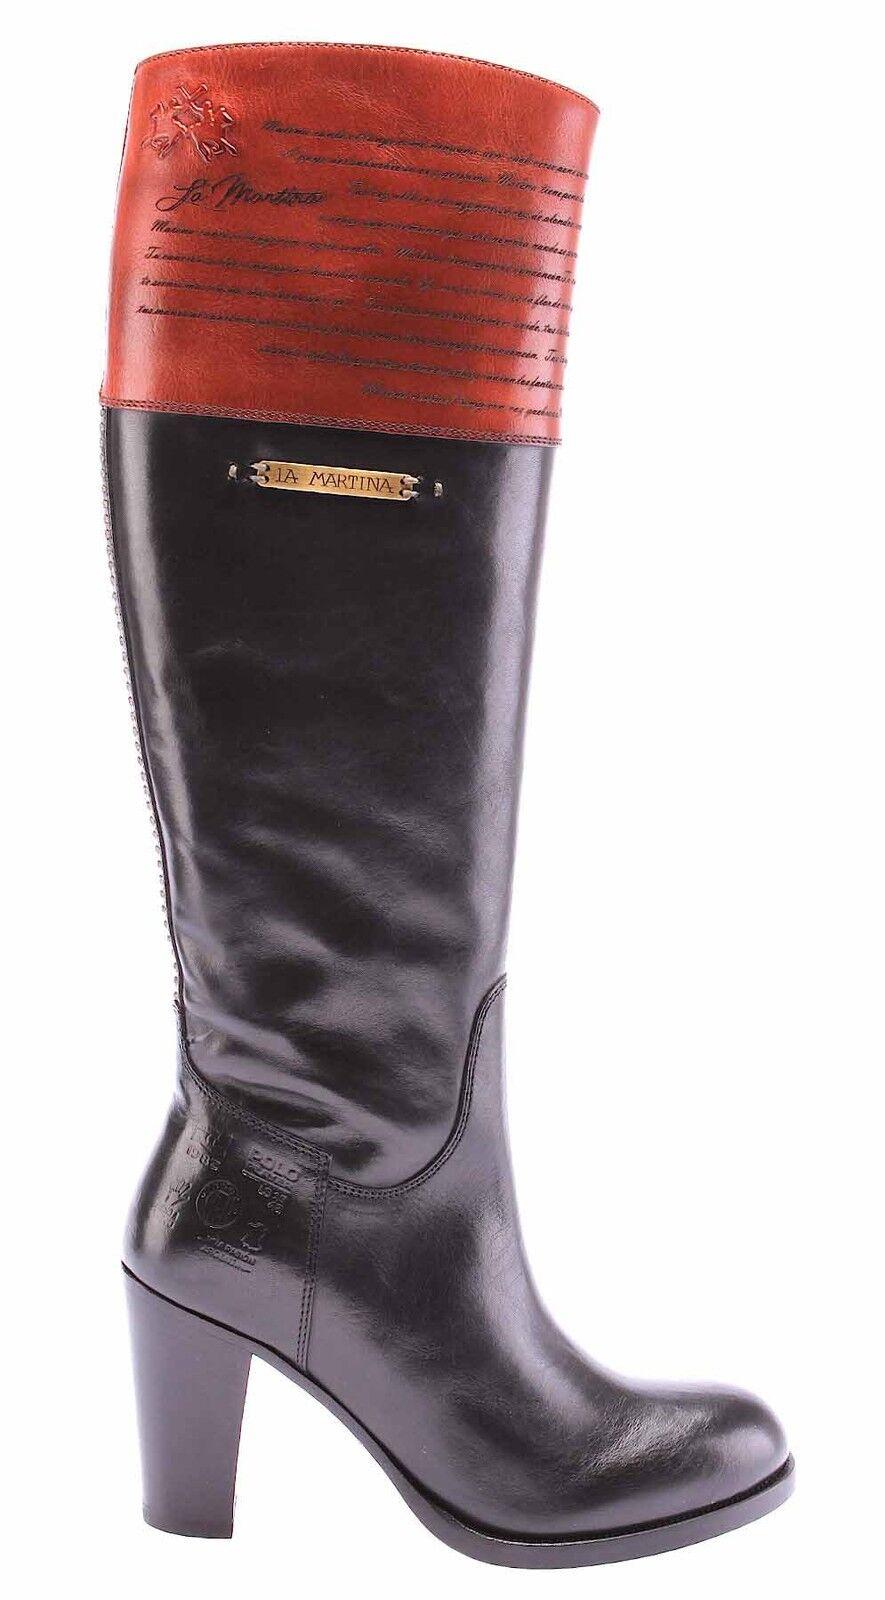 Damen Boot Stiefel Boot Damen Schuhe LA MARTINA L7105226 Cuero Nero Cuero Brandy Leder Neue beebbb